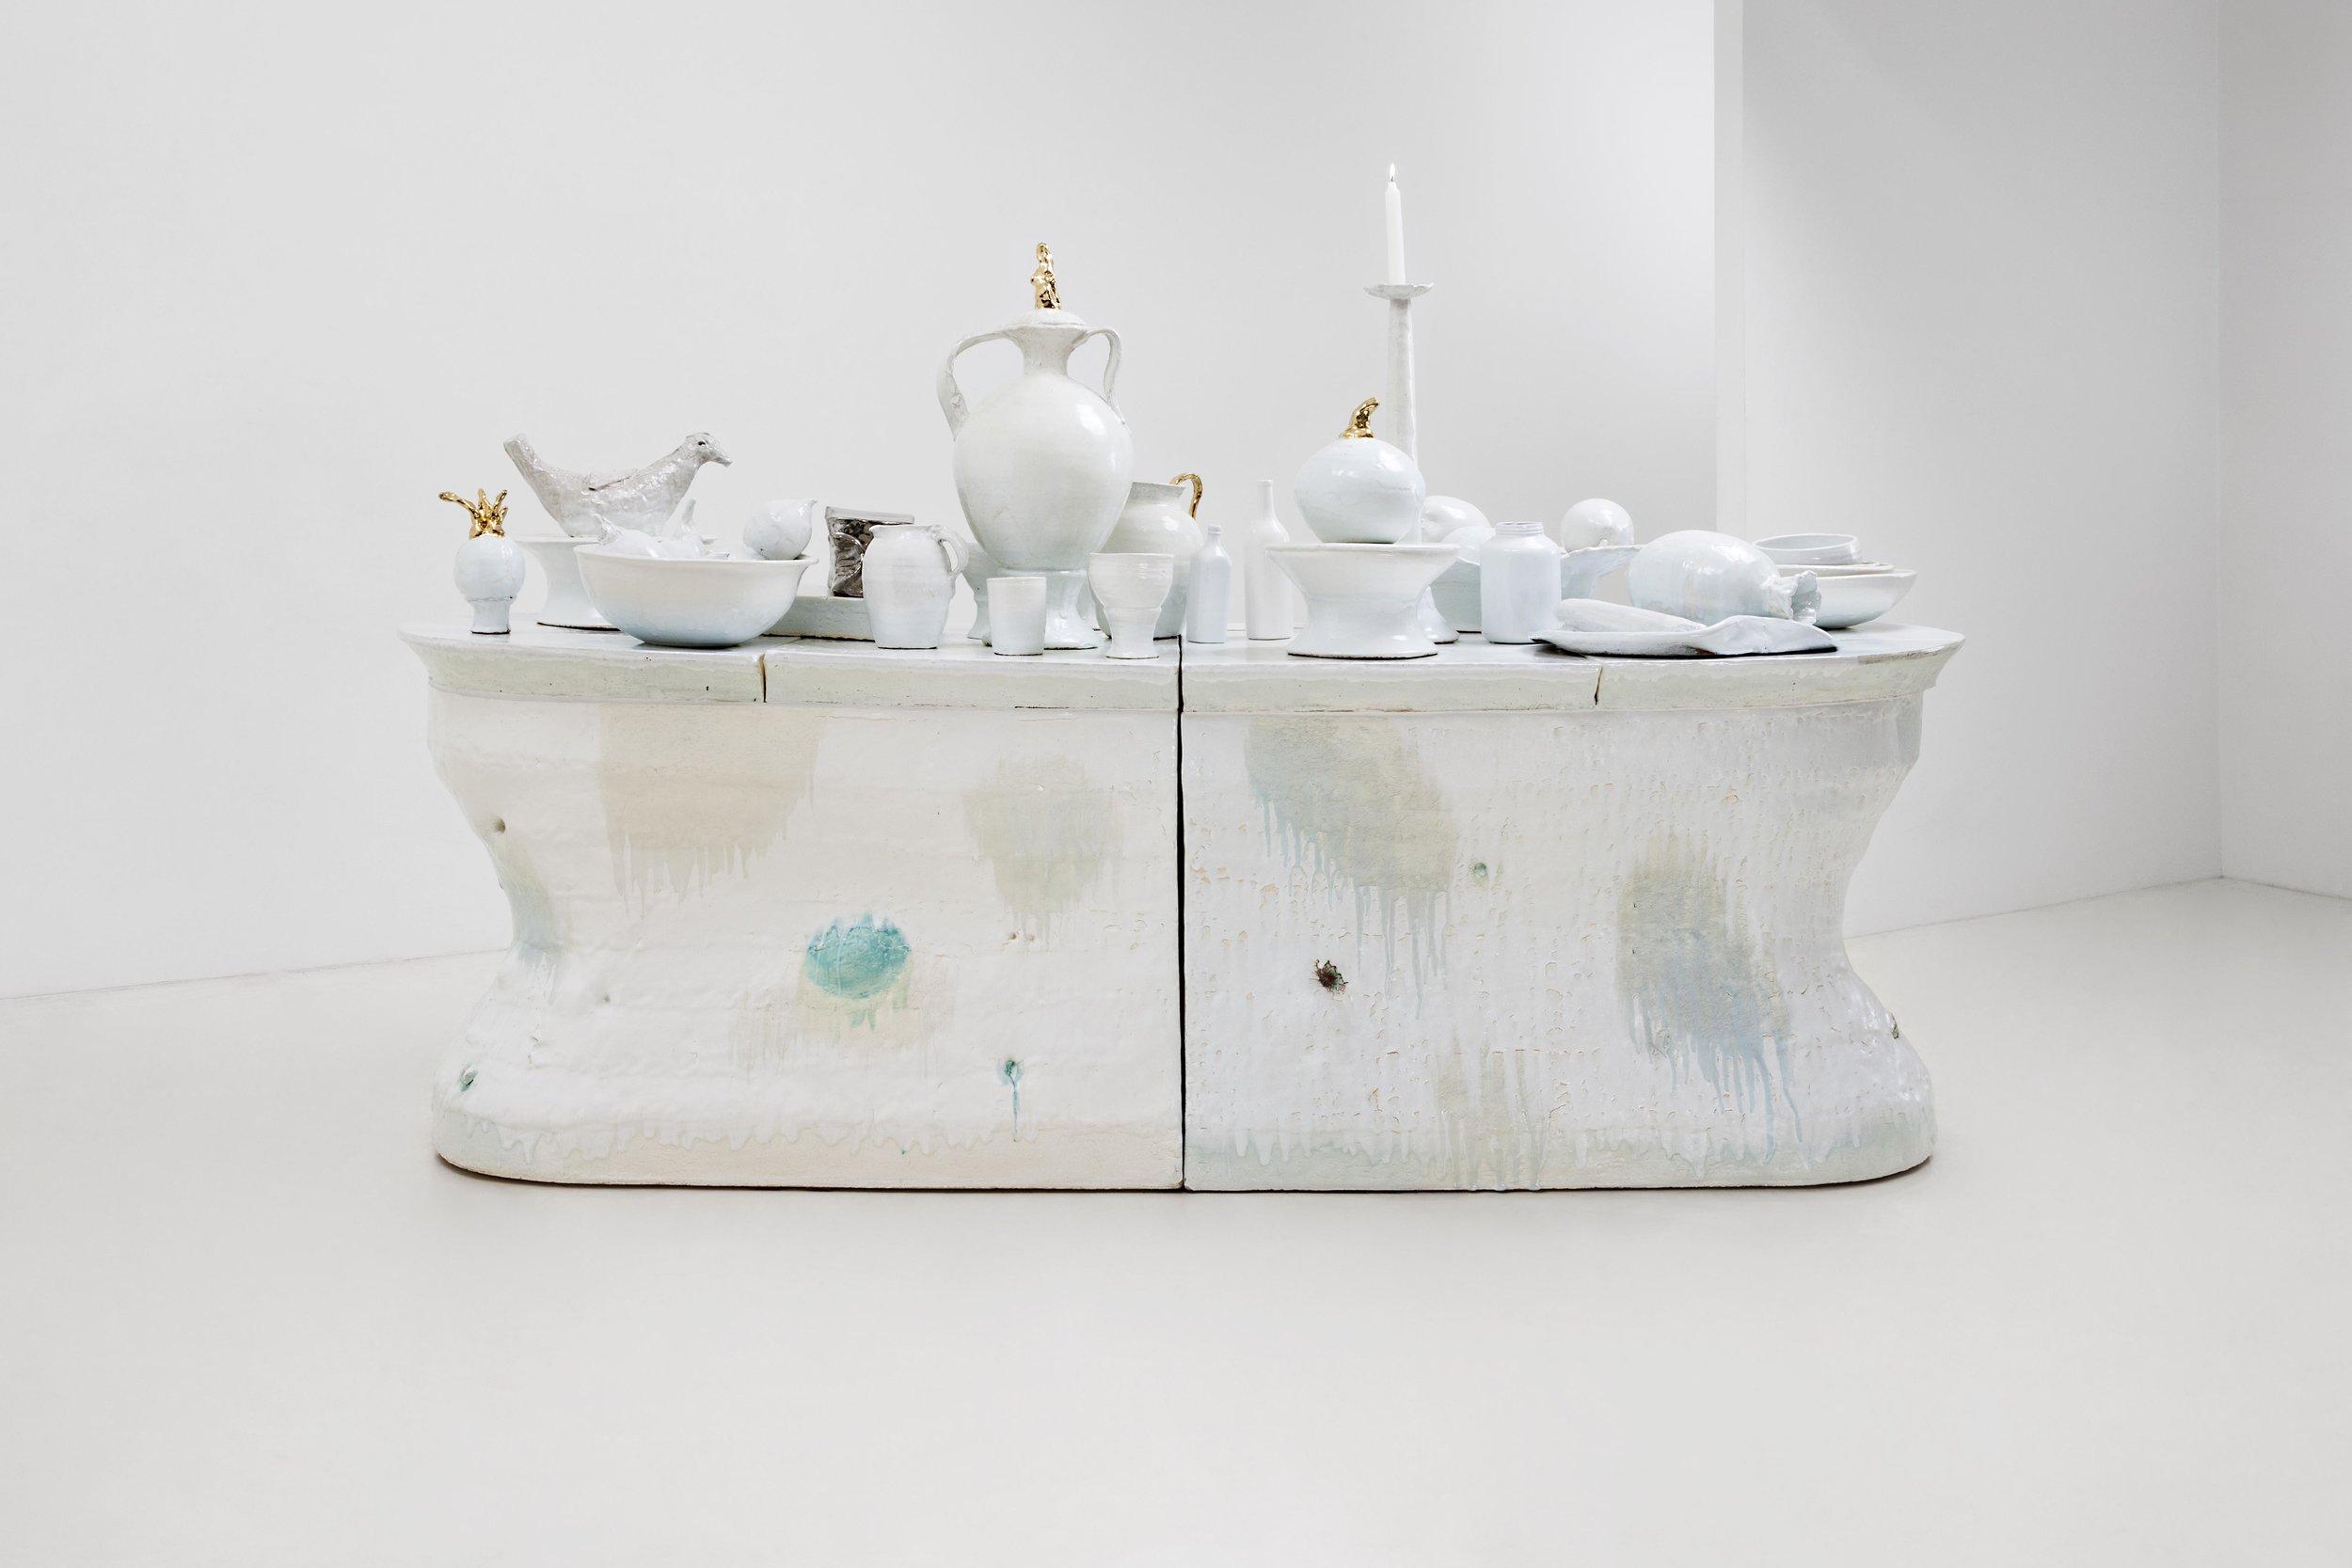 LEE Hun Chung,Bada160111-11,Glazed Ceramic ,276W x 100D x 92H cm,108.7W x 39.4D x 36.2H inch,(Object on the table 77~72H cm),2015 (2).jpg